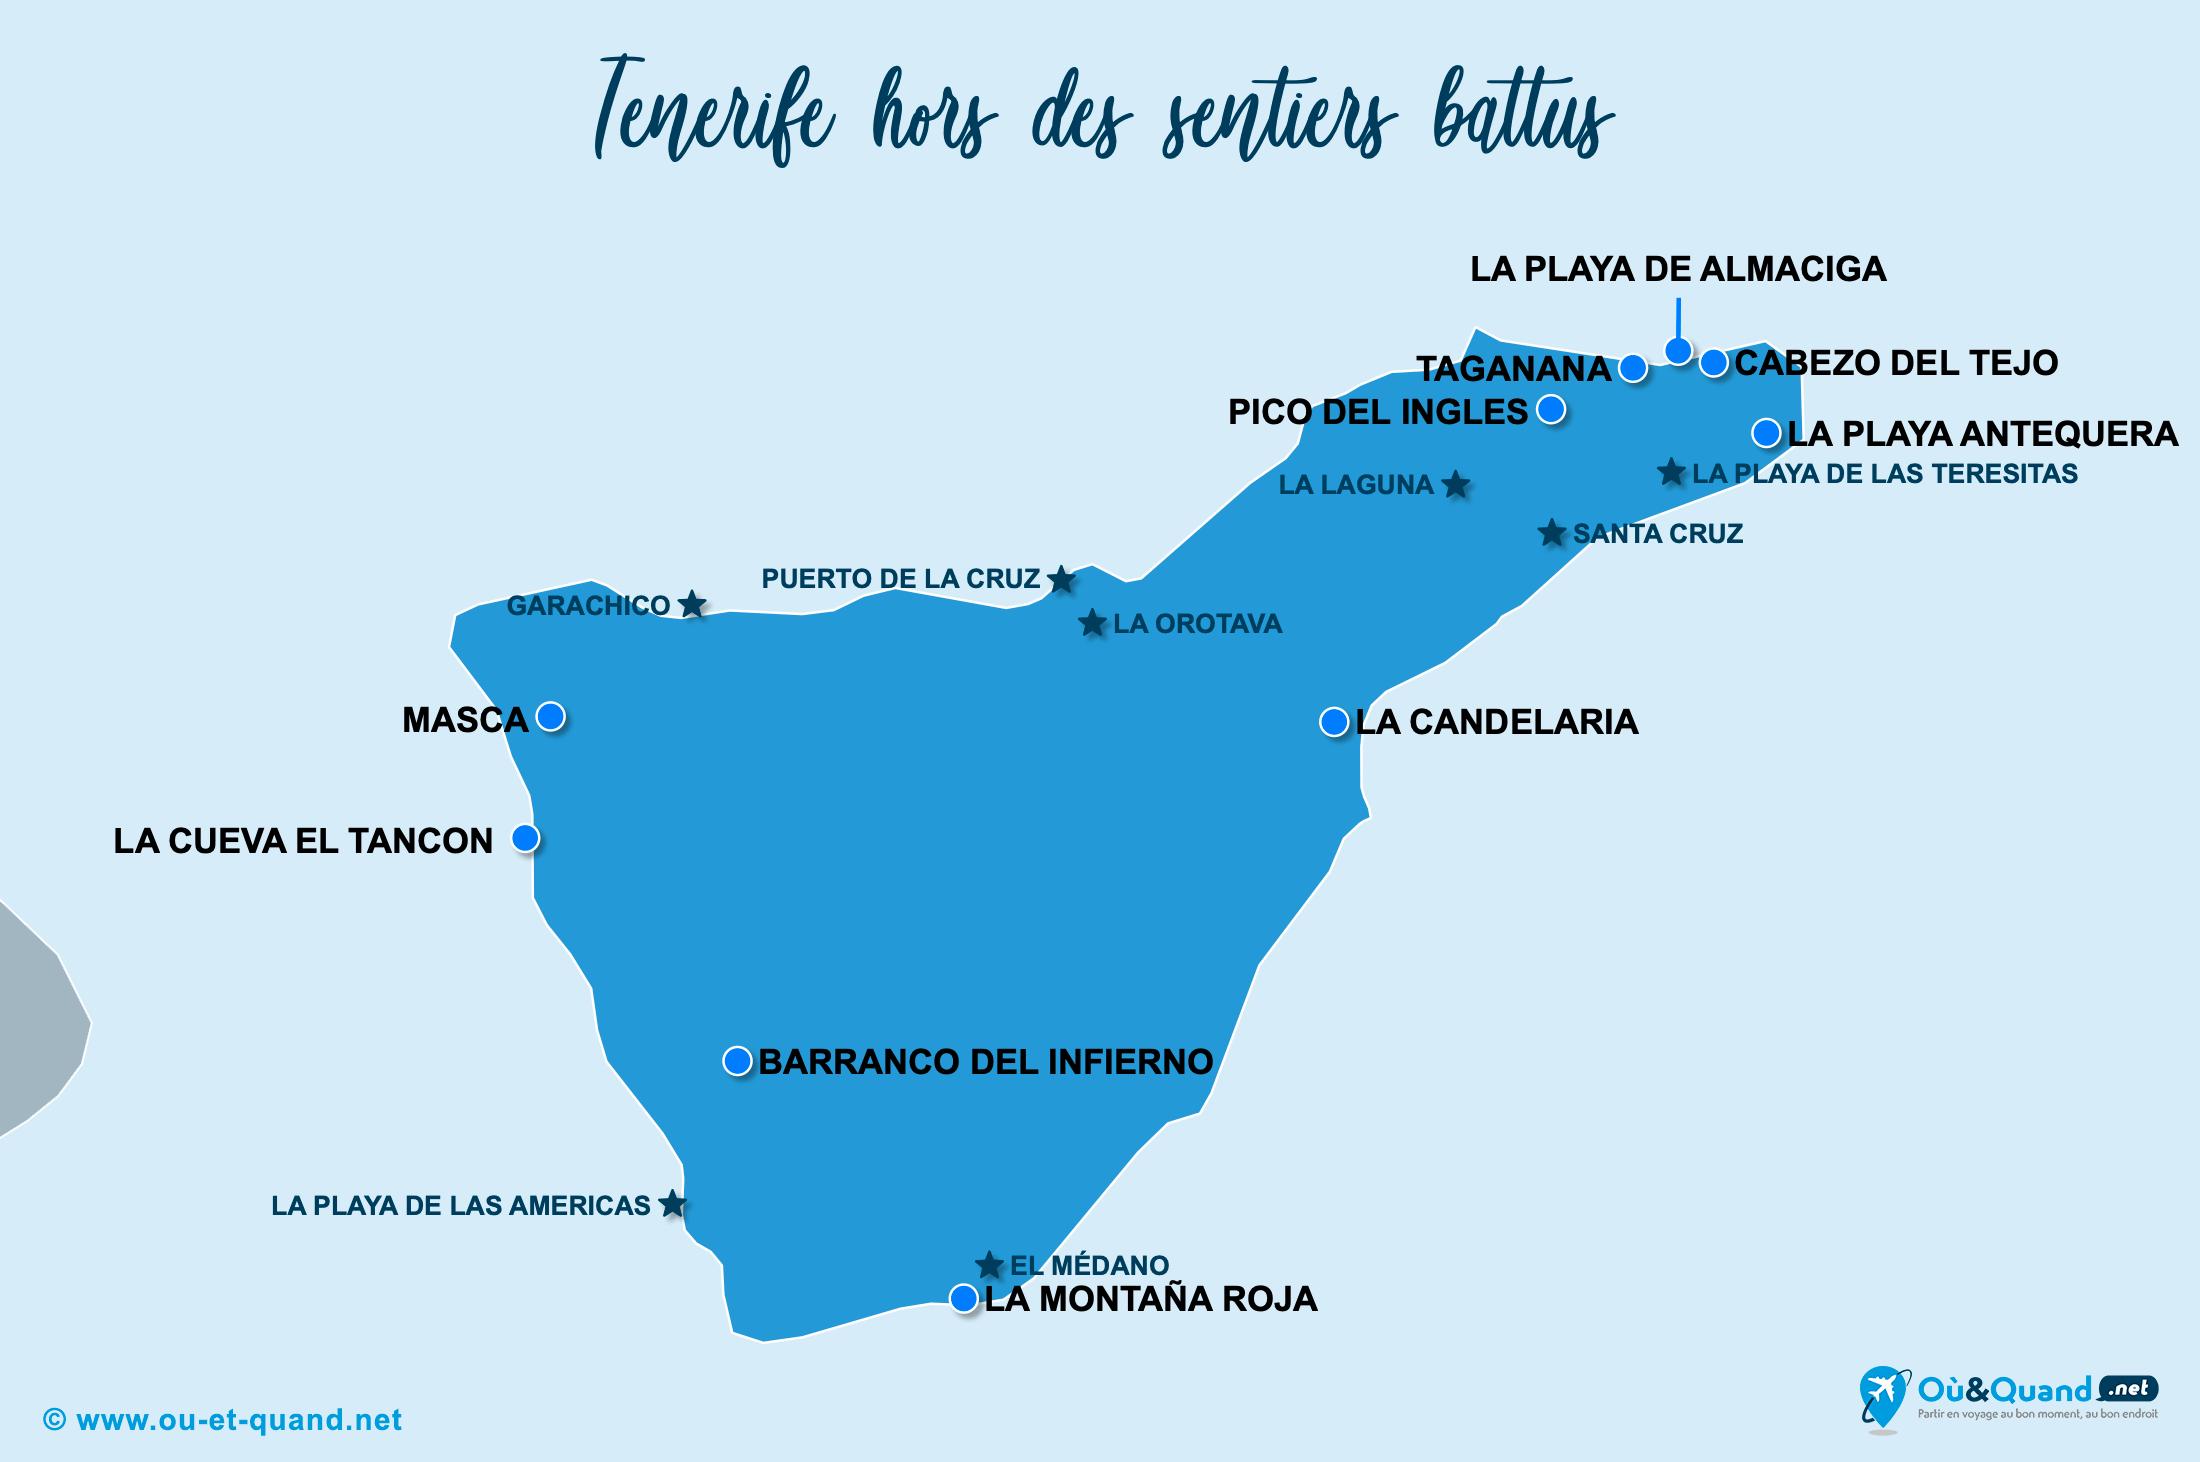 Carte Tenerife : Tenerife hors des sentiers battus